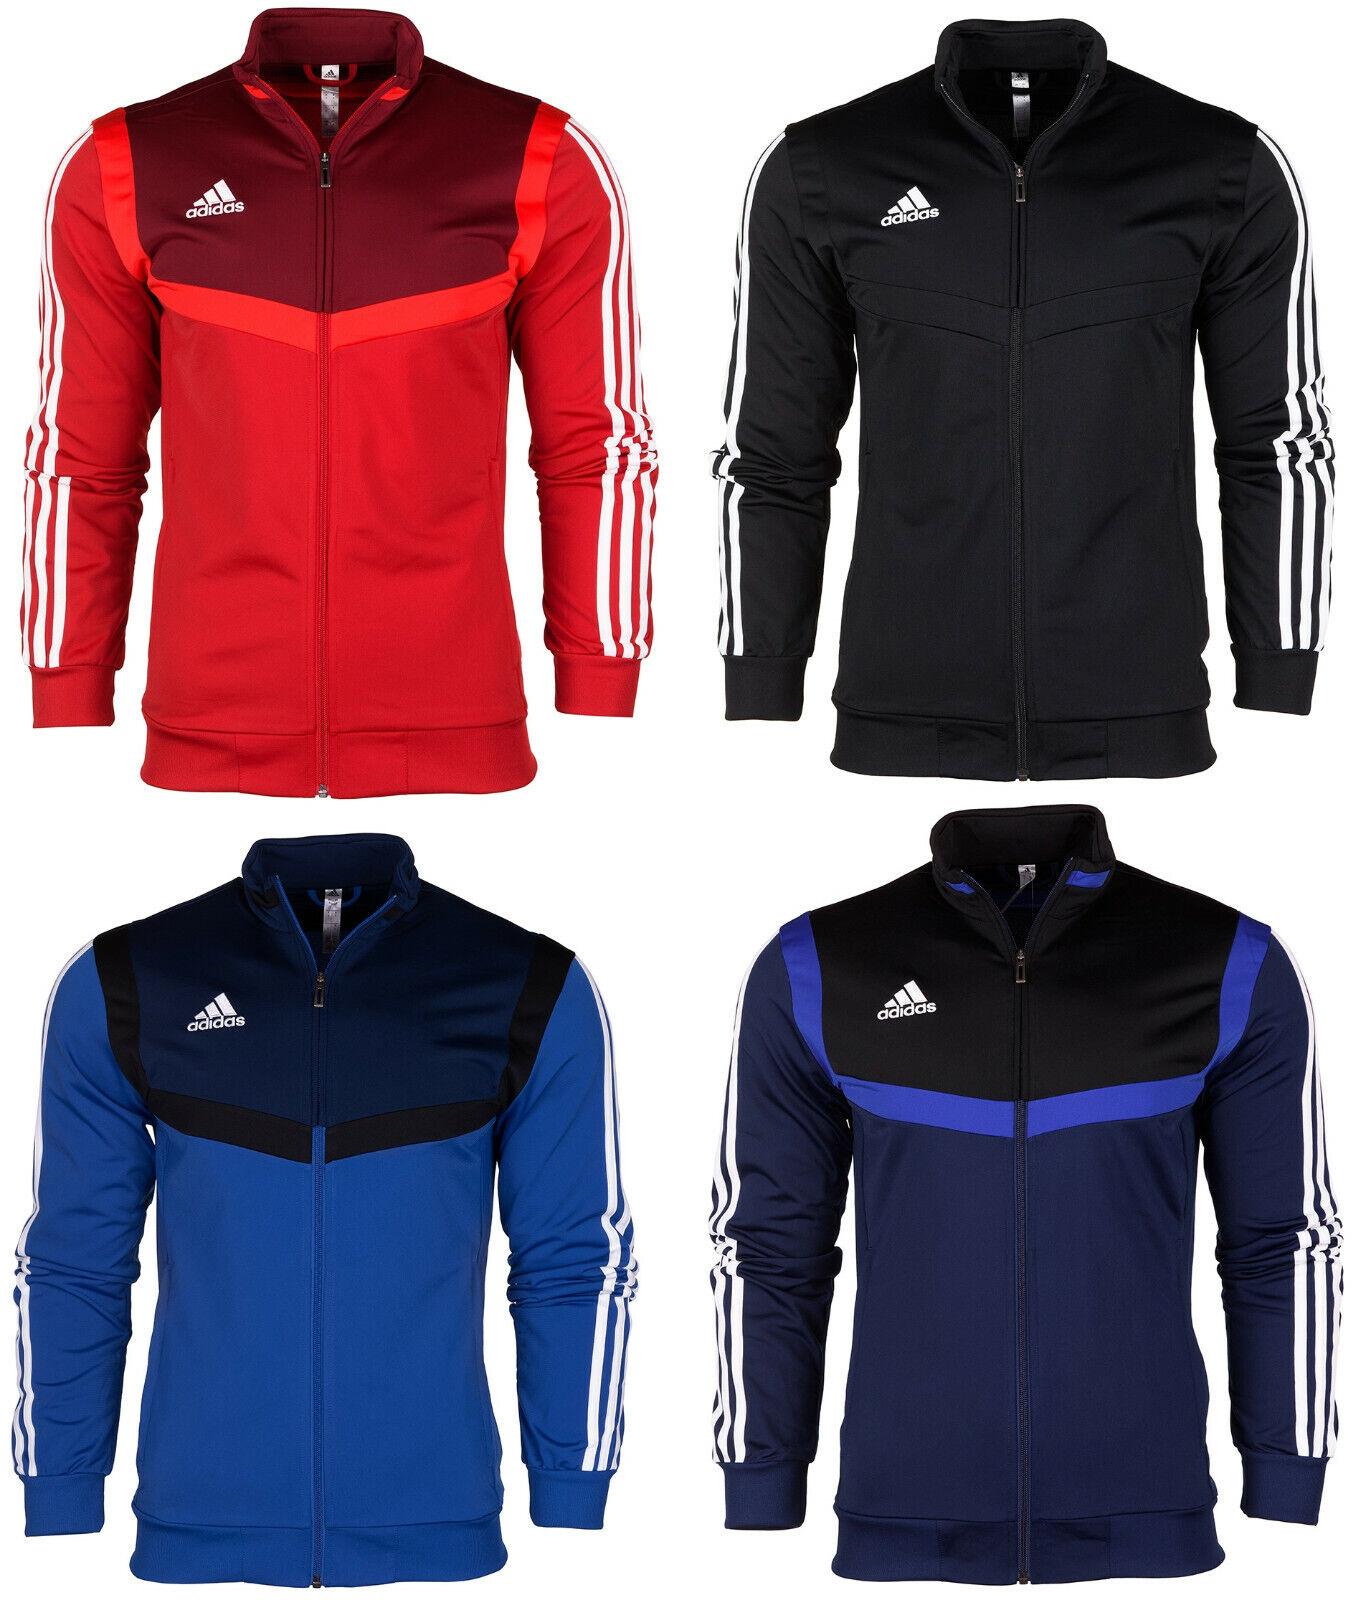 Adidas Herren tiro 19 Pes Trainingsjacke Jacket Track Top Jacke